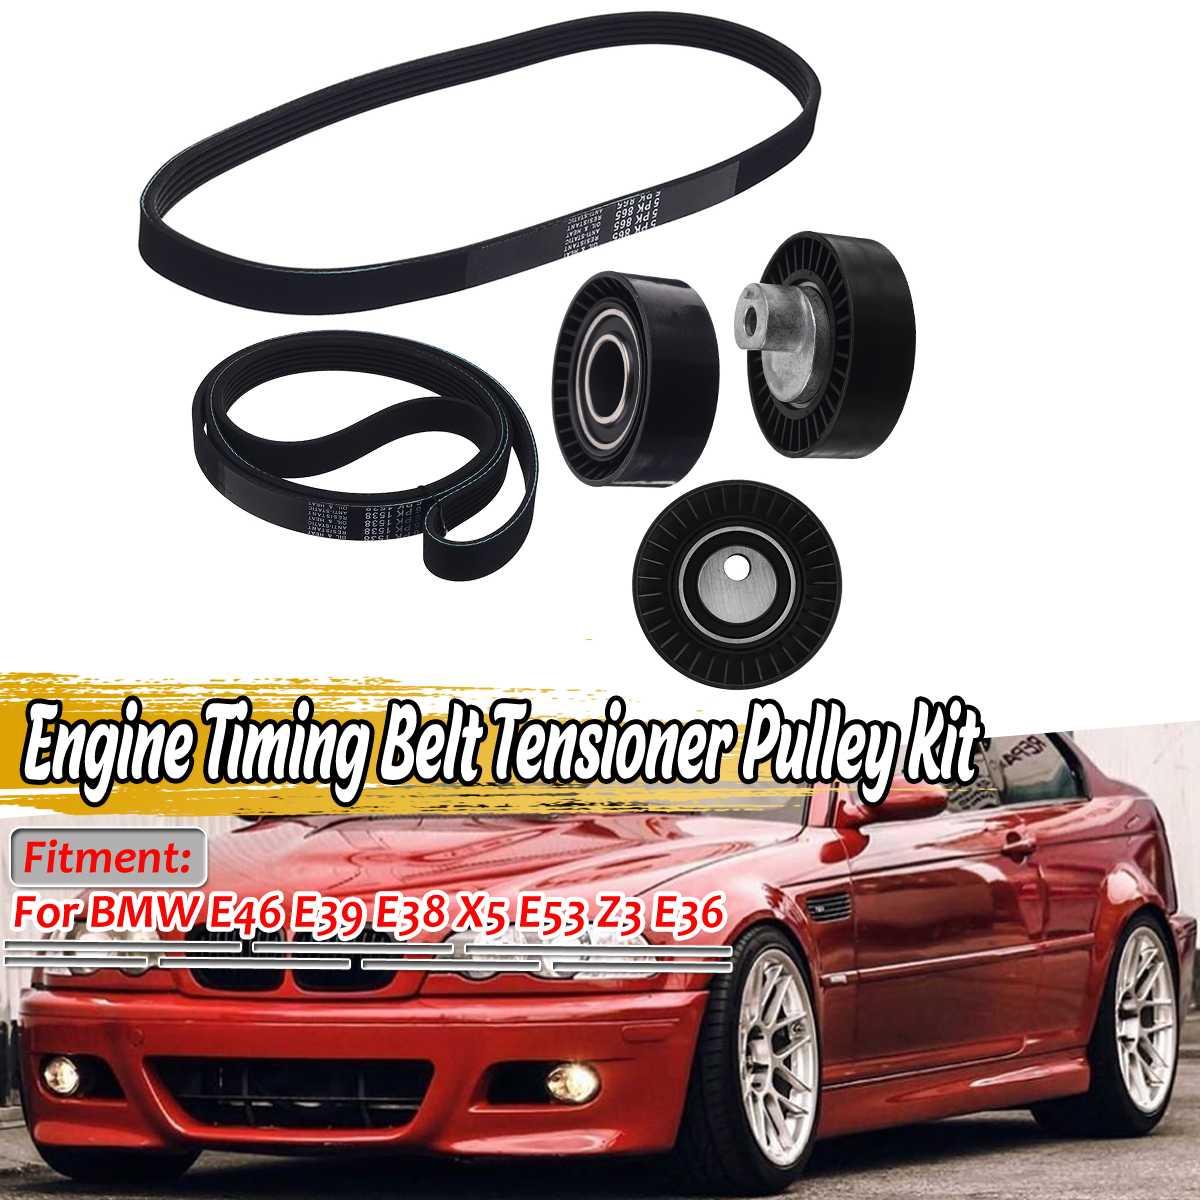 New Car Engine Timing Belt Tensioner Pulley Kit For BMW E46 E39 E38 X5 E53 Z3 E36 11281437475 11281706545 1706545